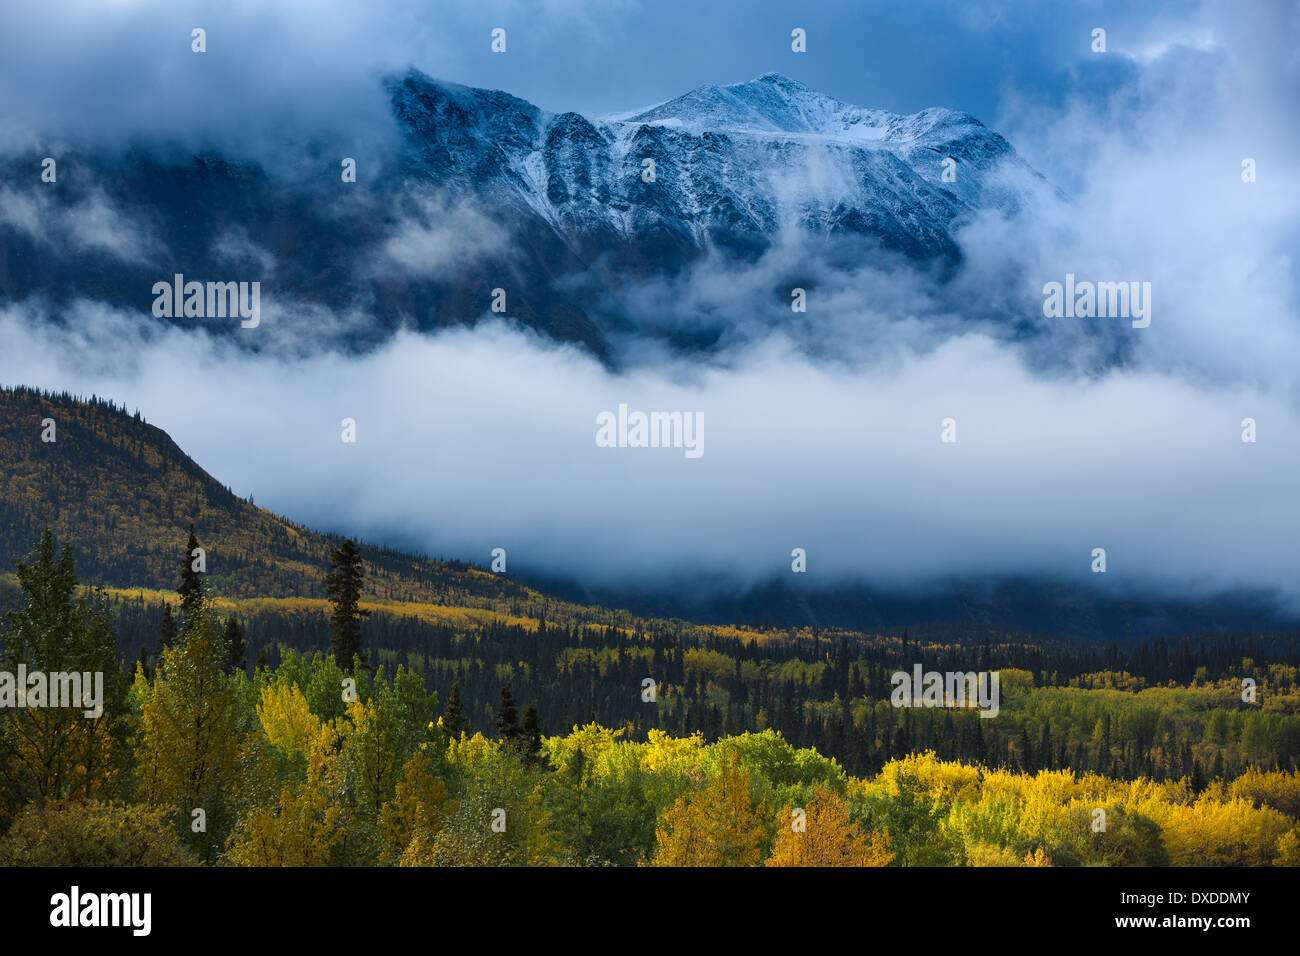 Herbstfärbung und Young Peak, British Columbia, Kanada Stockbild